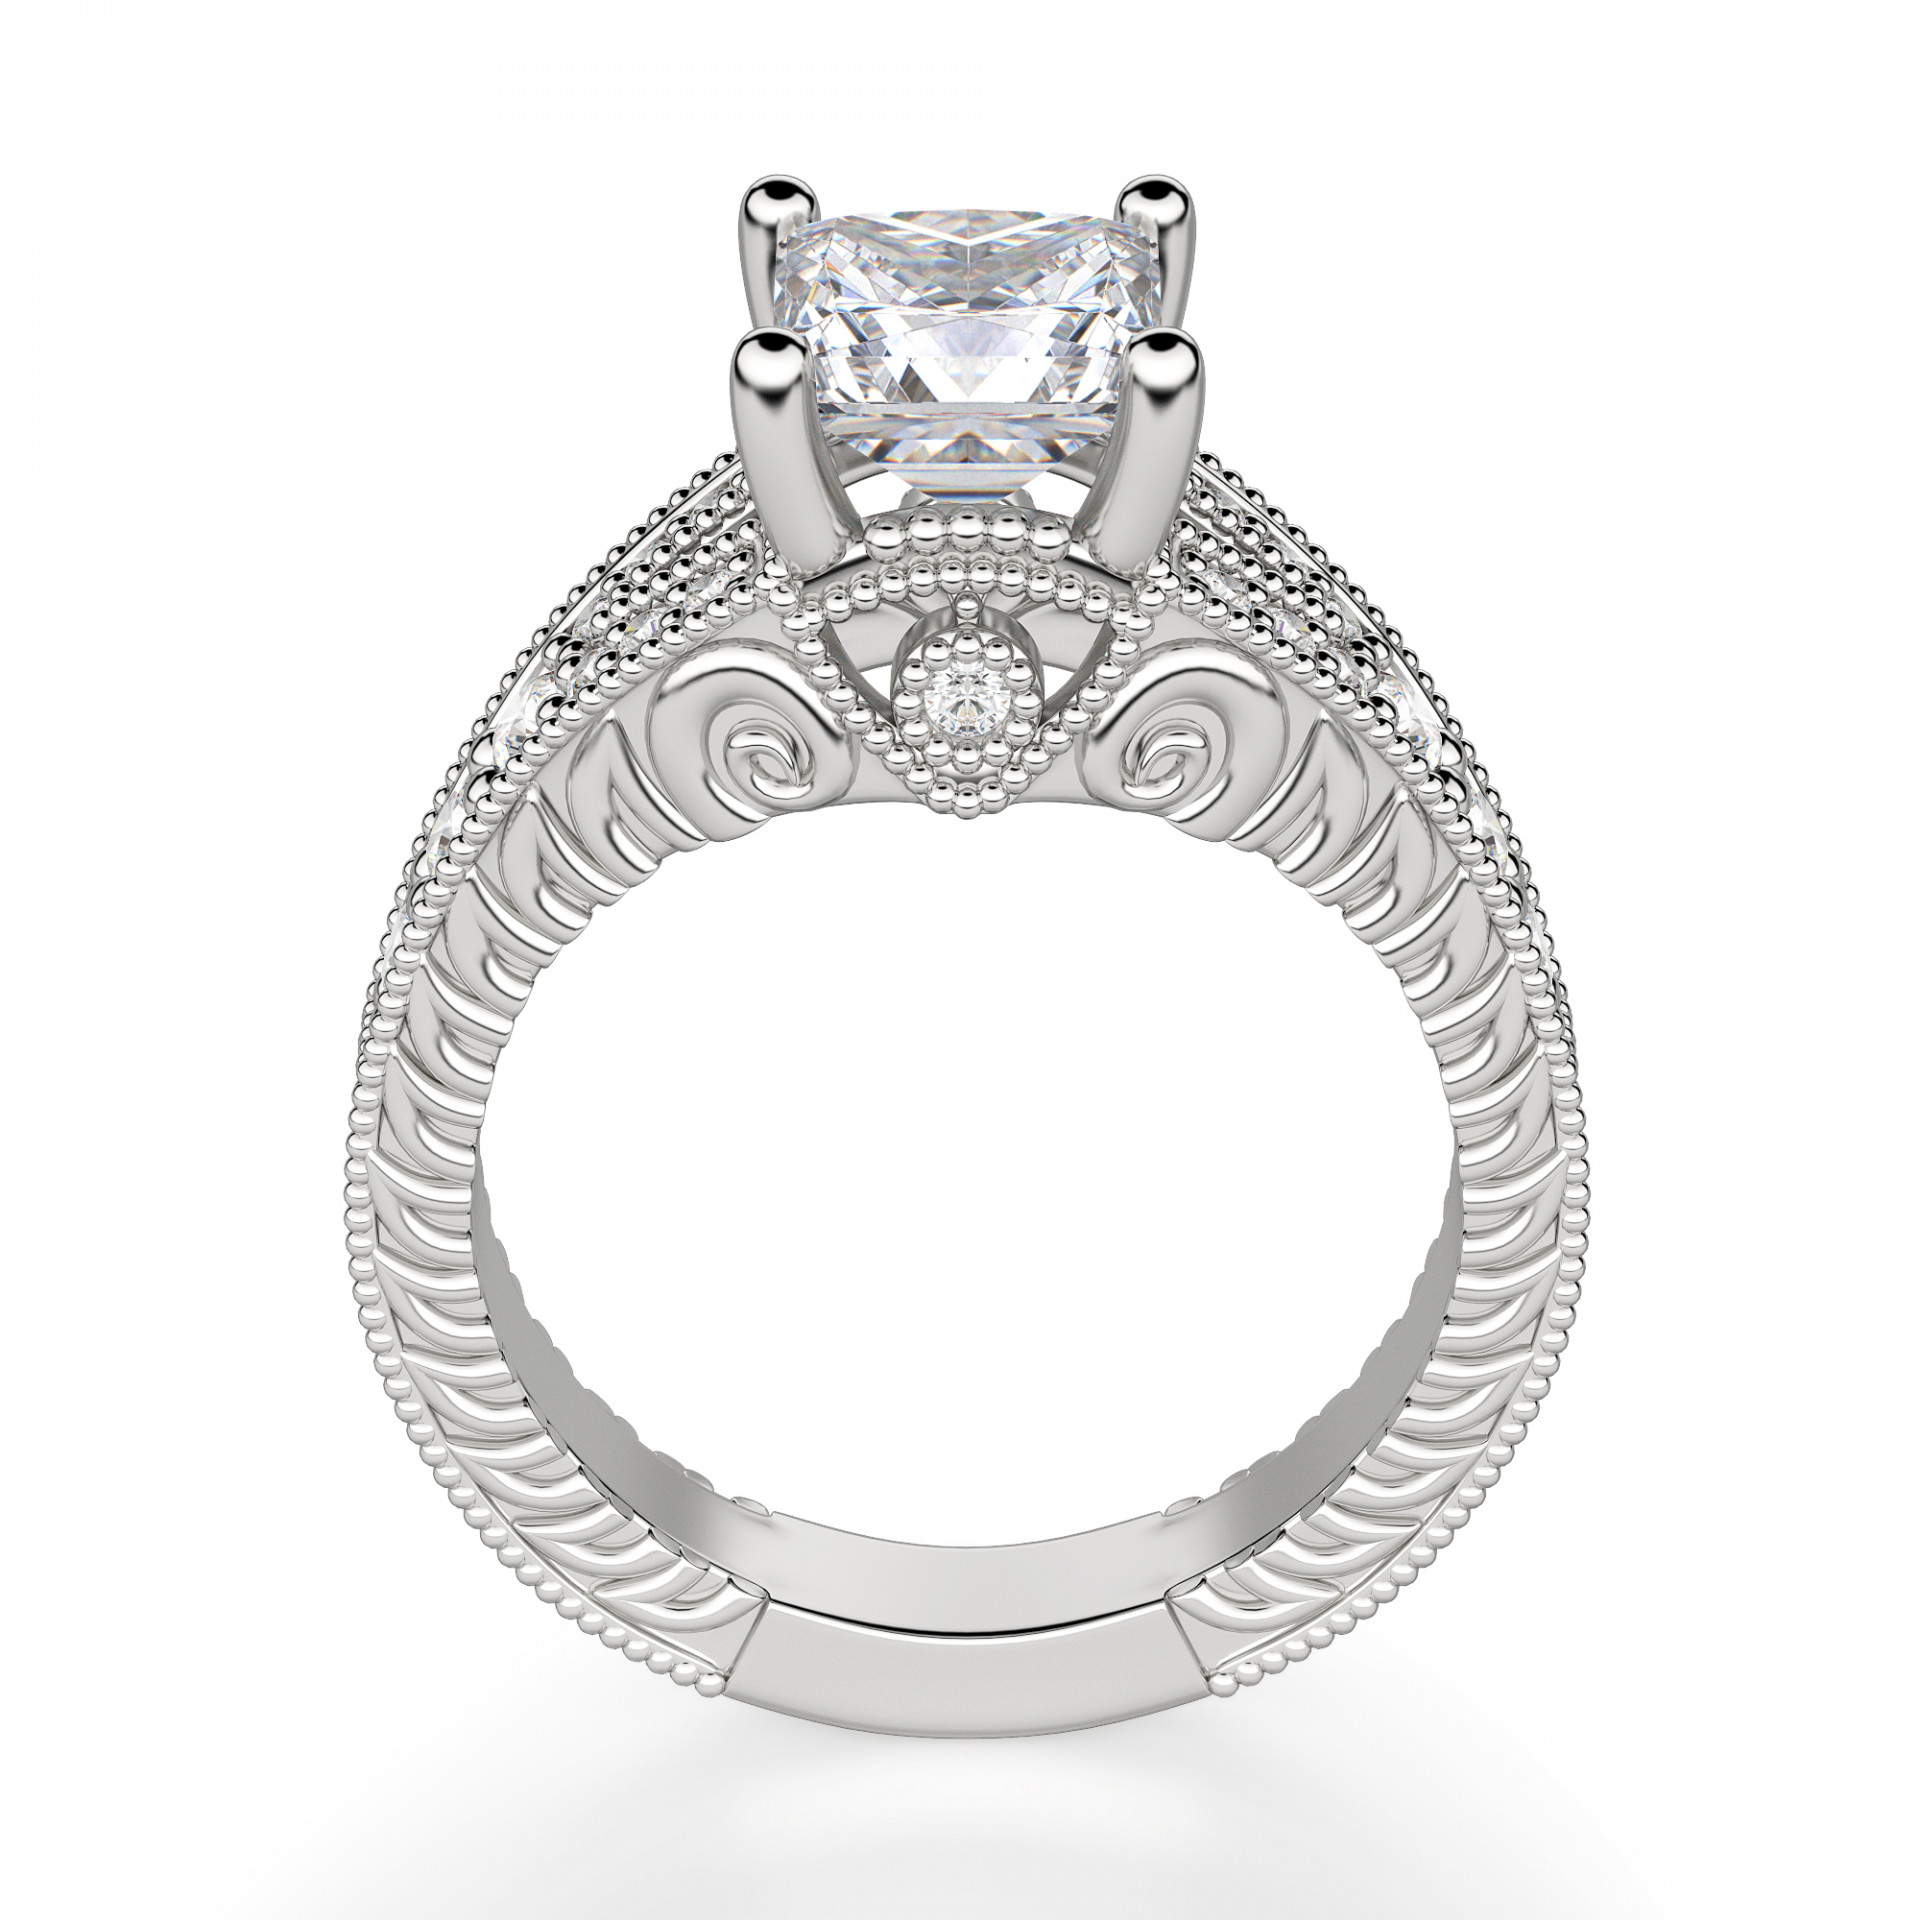 Discreet 1 Ct Princess Cut Diamond Engagement Wedding Ring 14k Solid Yellow Gold More Discounts Surprises Engagement Rings